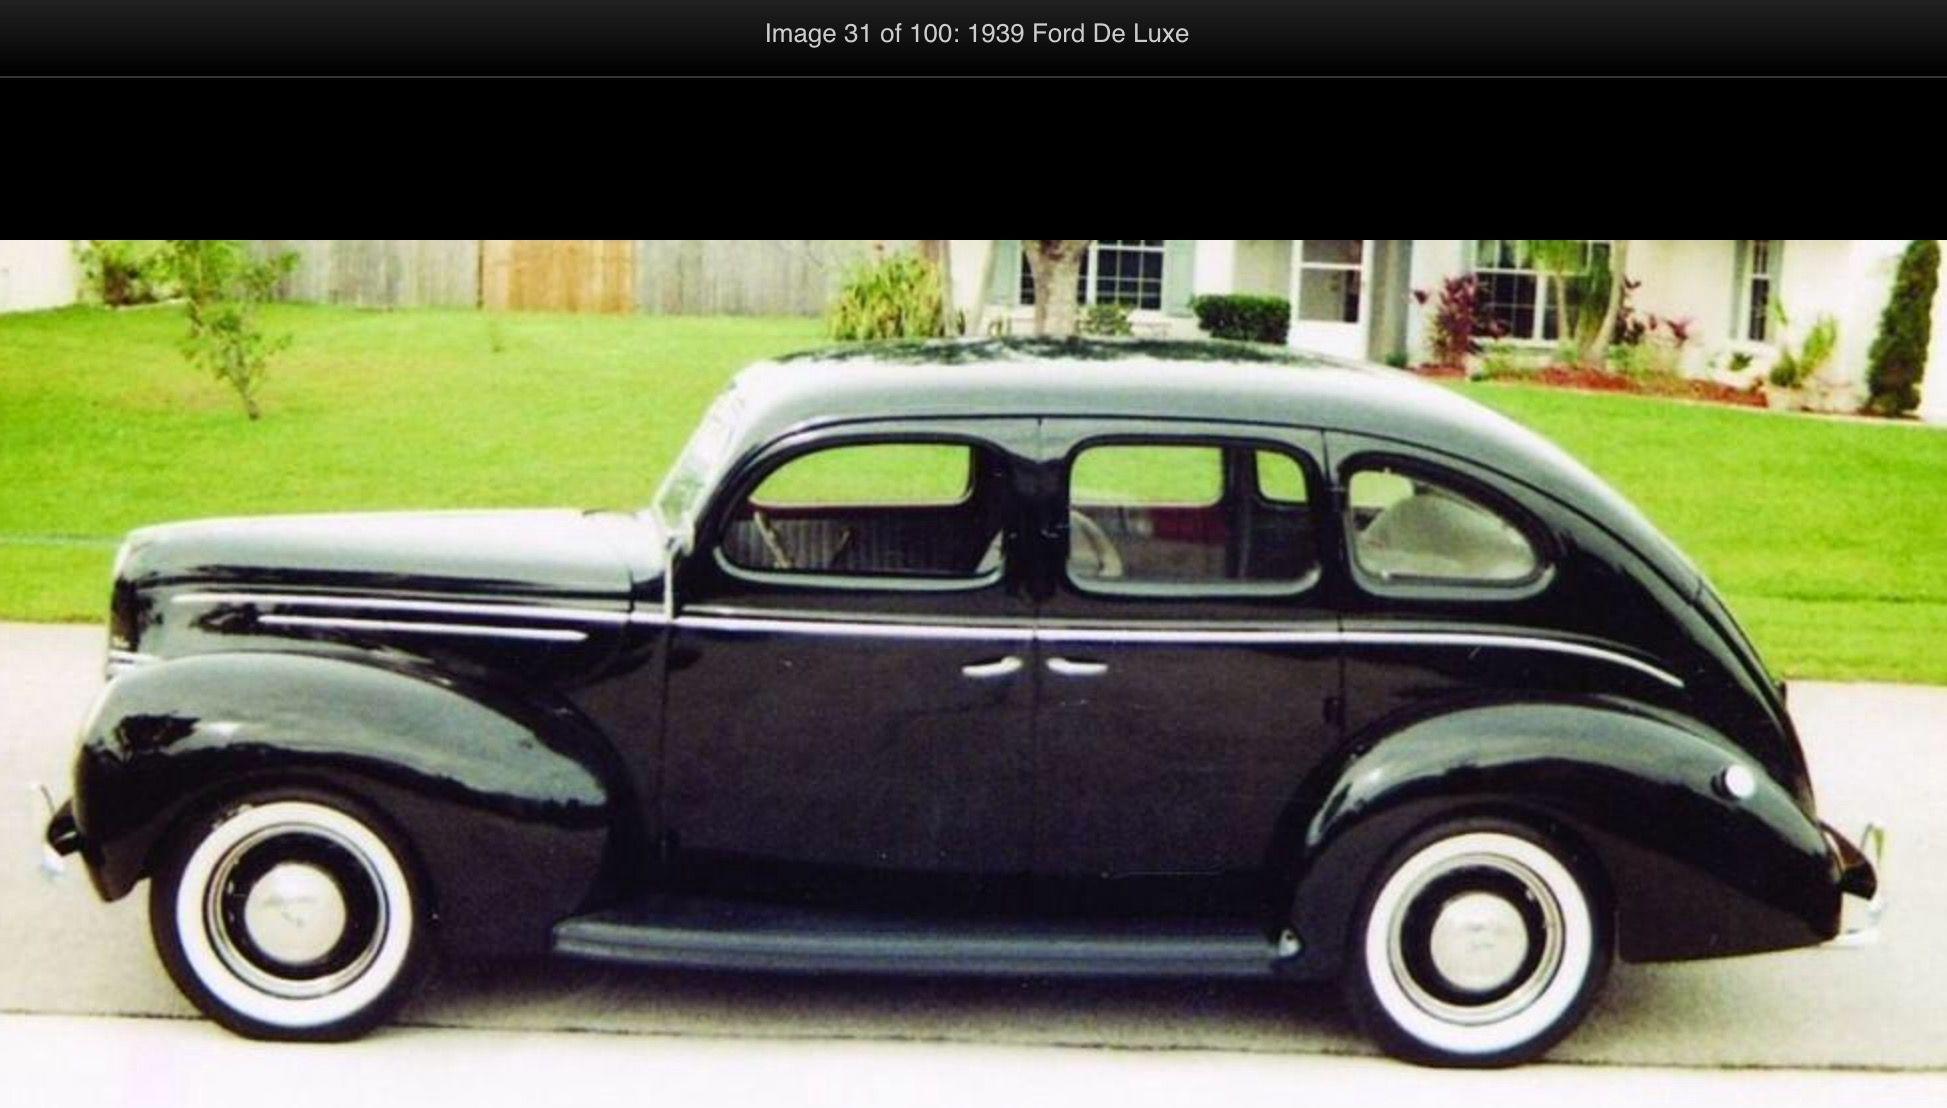 Pin by Gene Leachman on Cars sedans | Pinterest | Sedans and Cars